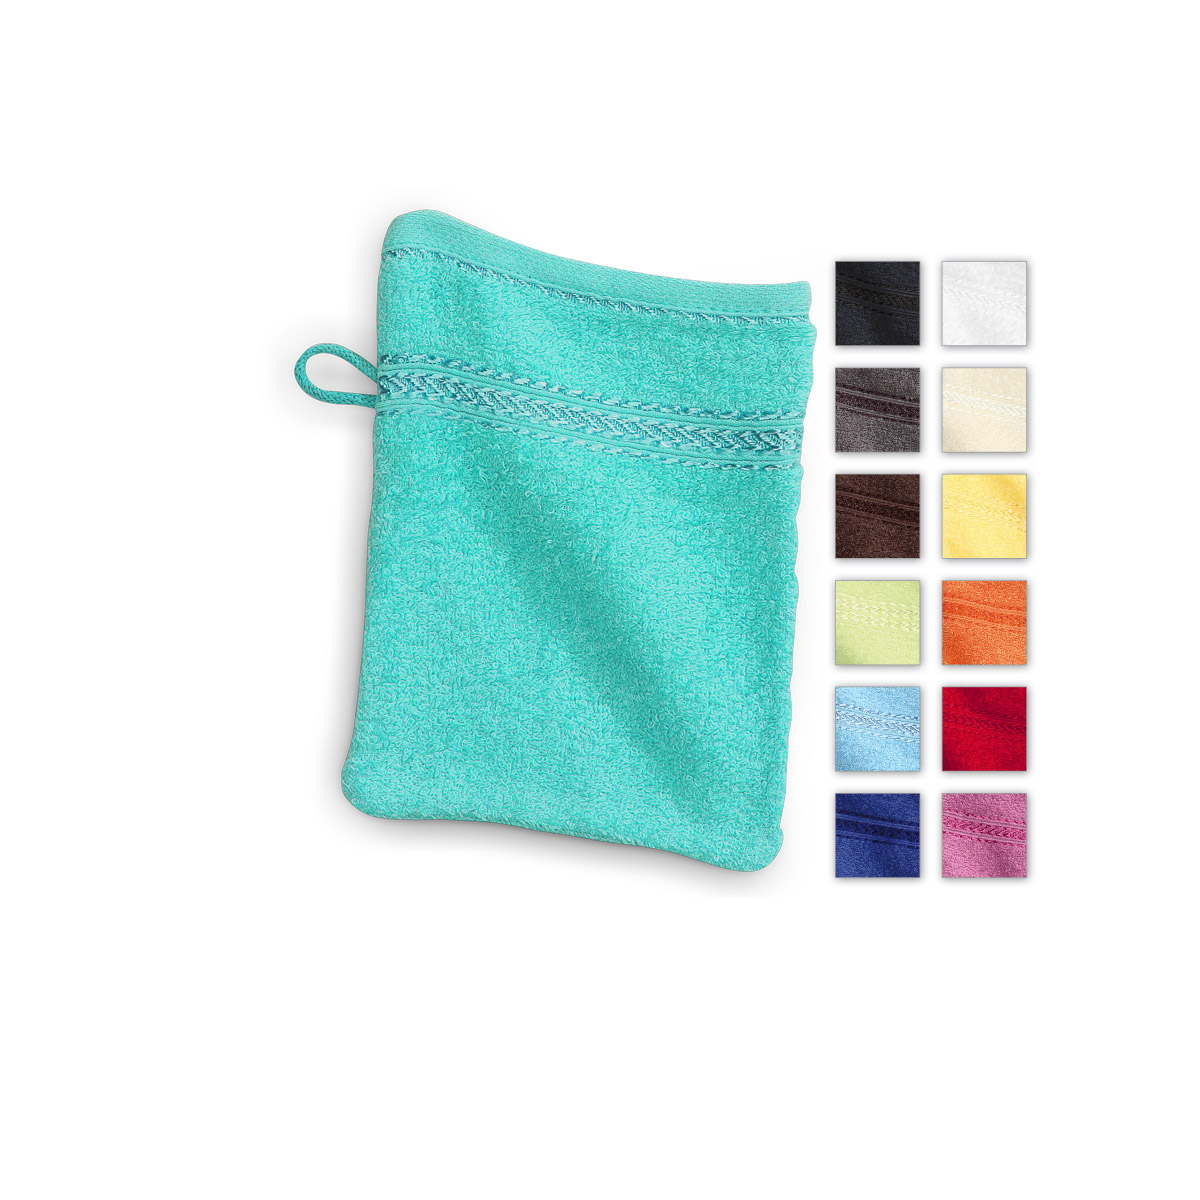 Washcloth Wash Cloth 100% Cotton Washing Glove Face Cloth 15x20 cm